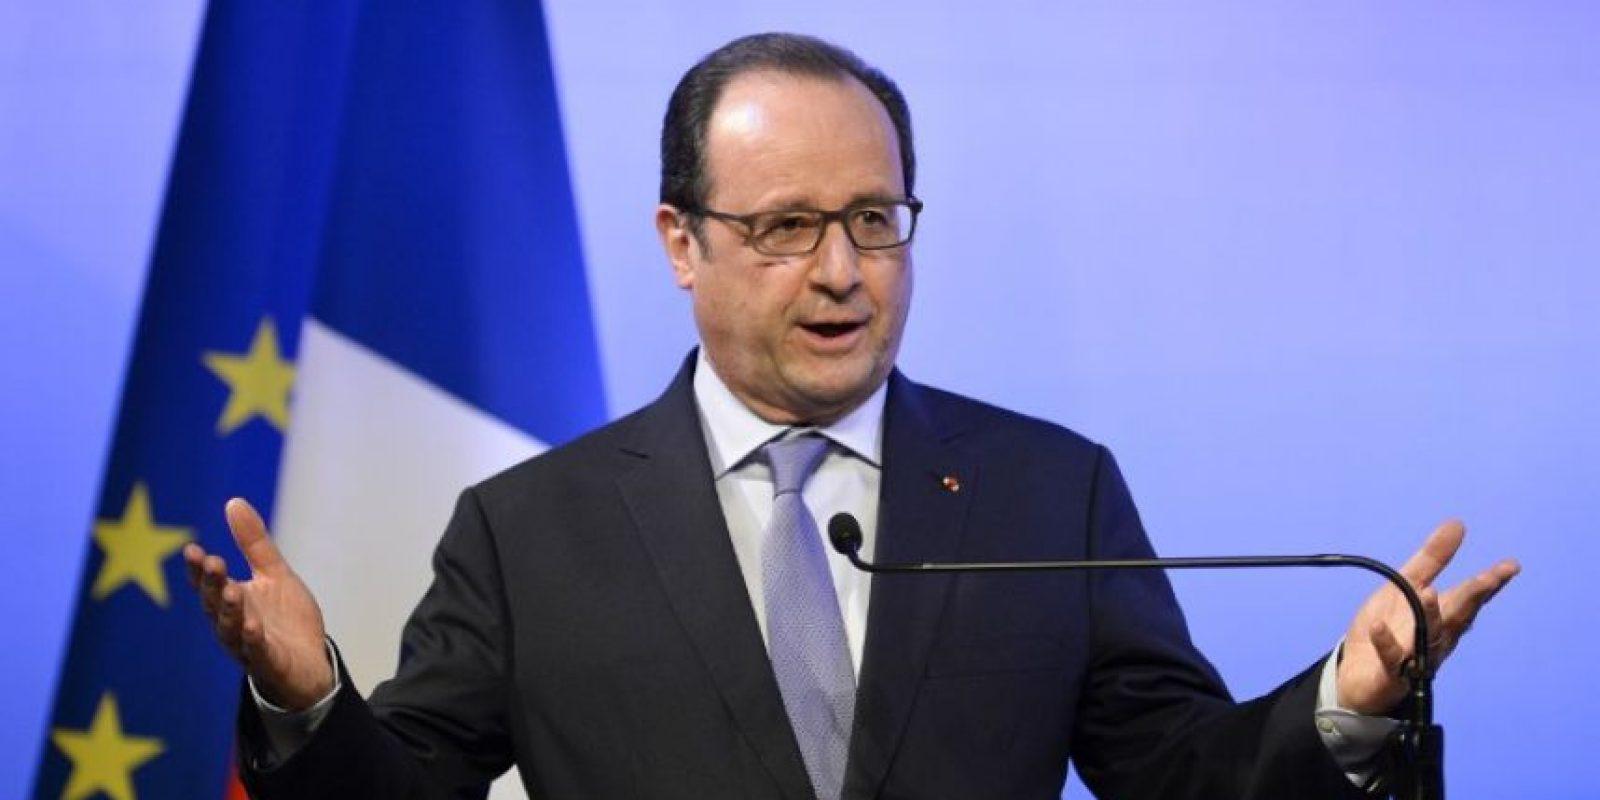 El presidente francés, Francois Hollande, inició este miércoles su visita a Argentina. Foto:AFP